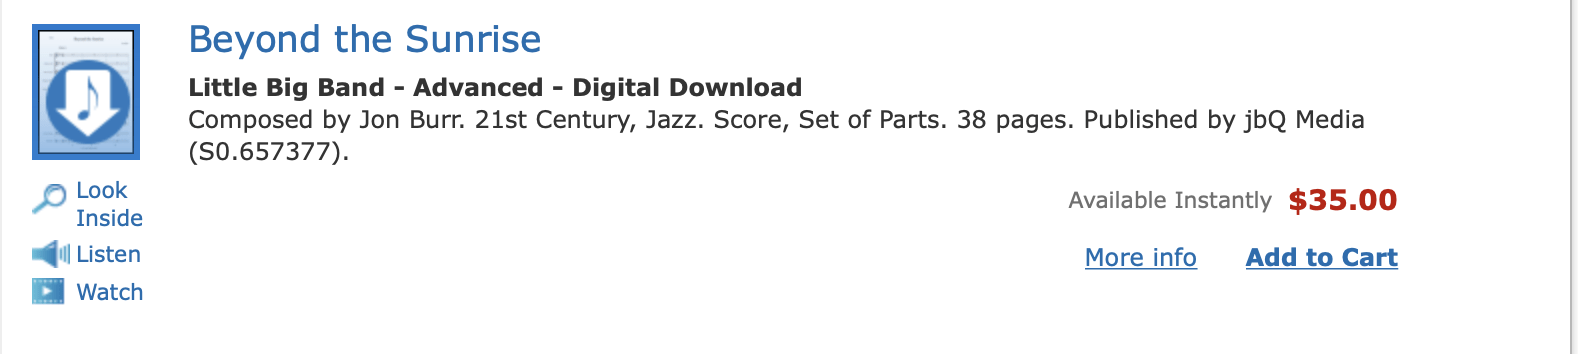 Beyond the Sunrise on Sheet Music Plus